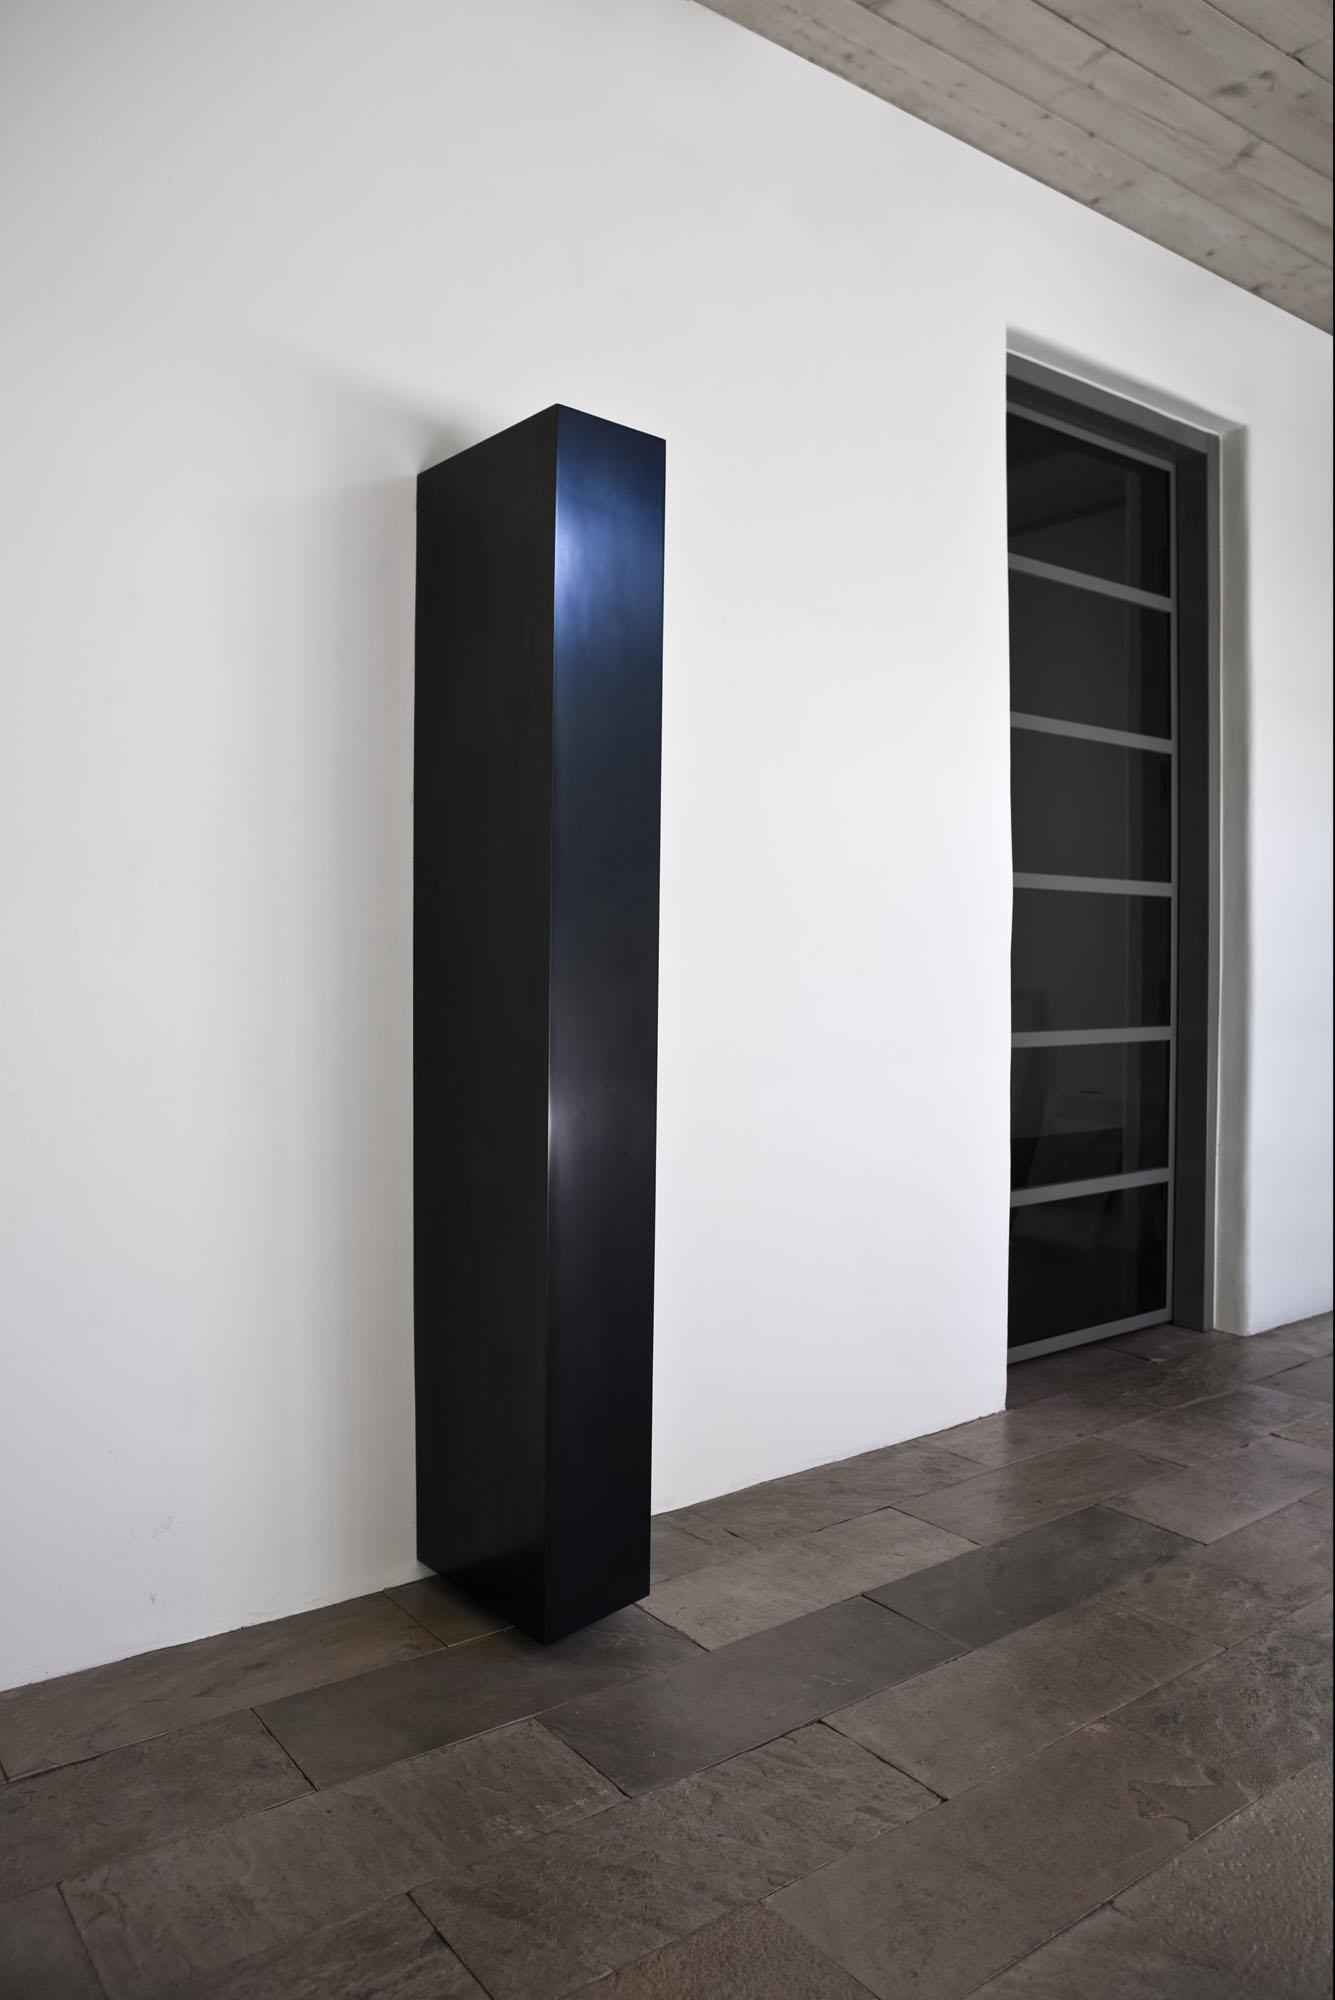 "Tiltled Column, 2008  Solid Graphite,70"" x 14"" x 15""  Photo: Jamey Stillings; courtesy of Lannan Foundation"